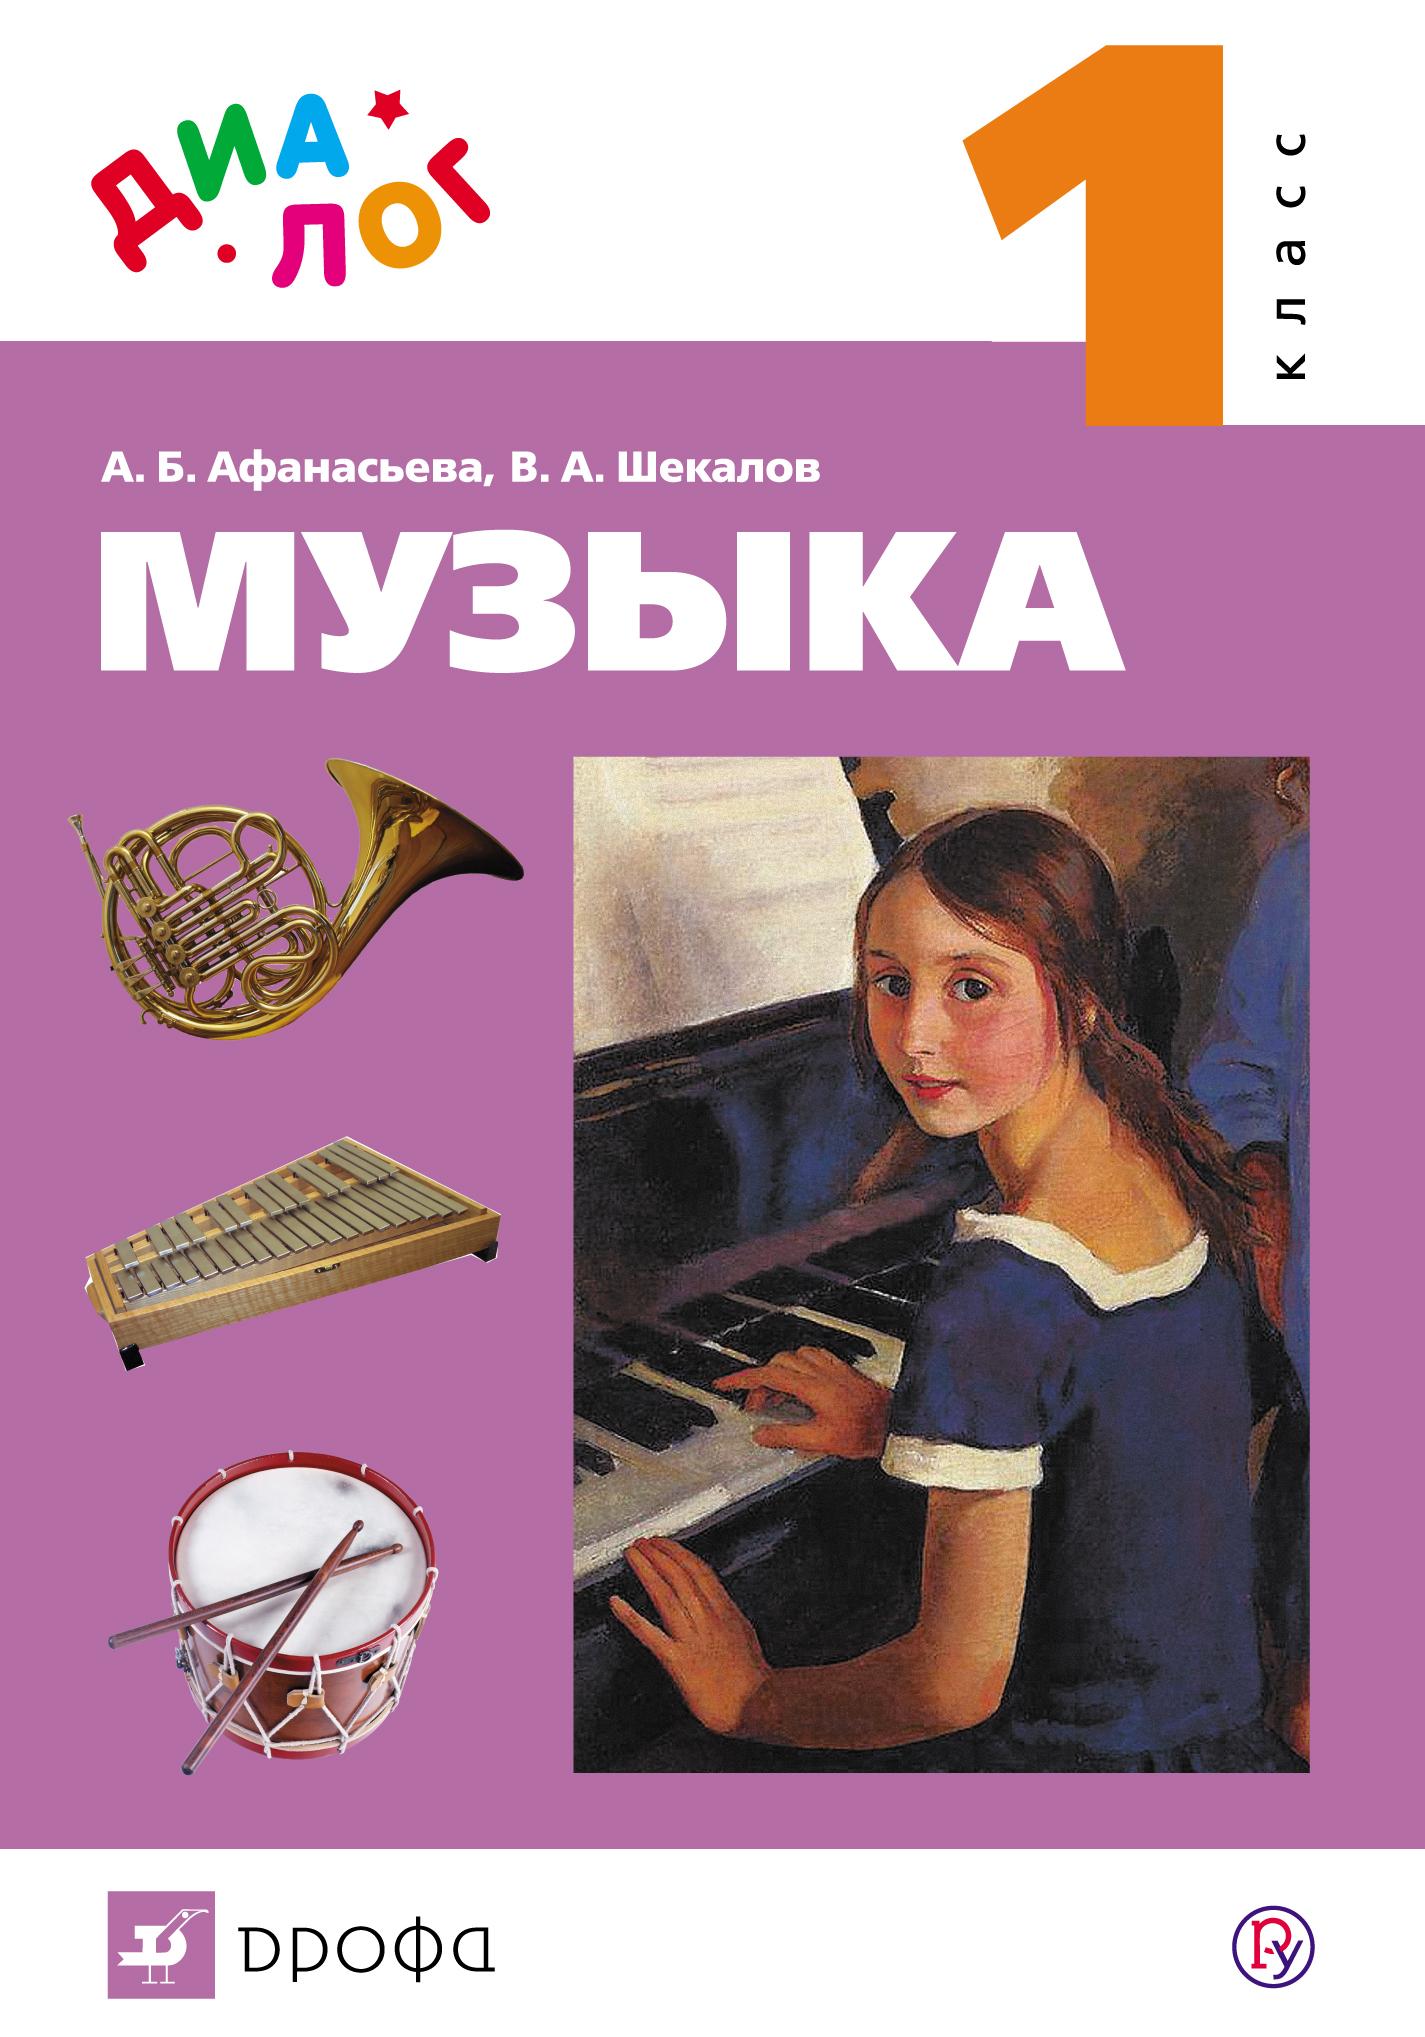 Афанасьева А.Б., Шекалов В.А. Музыка. 1 класс. Учебник + CD.